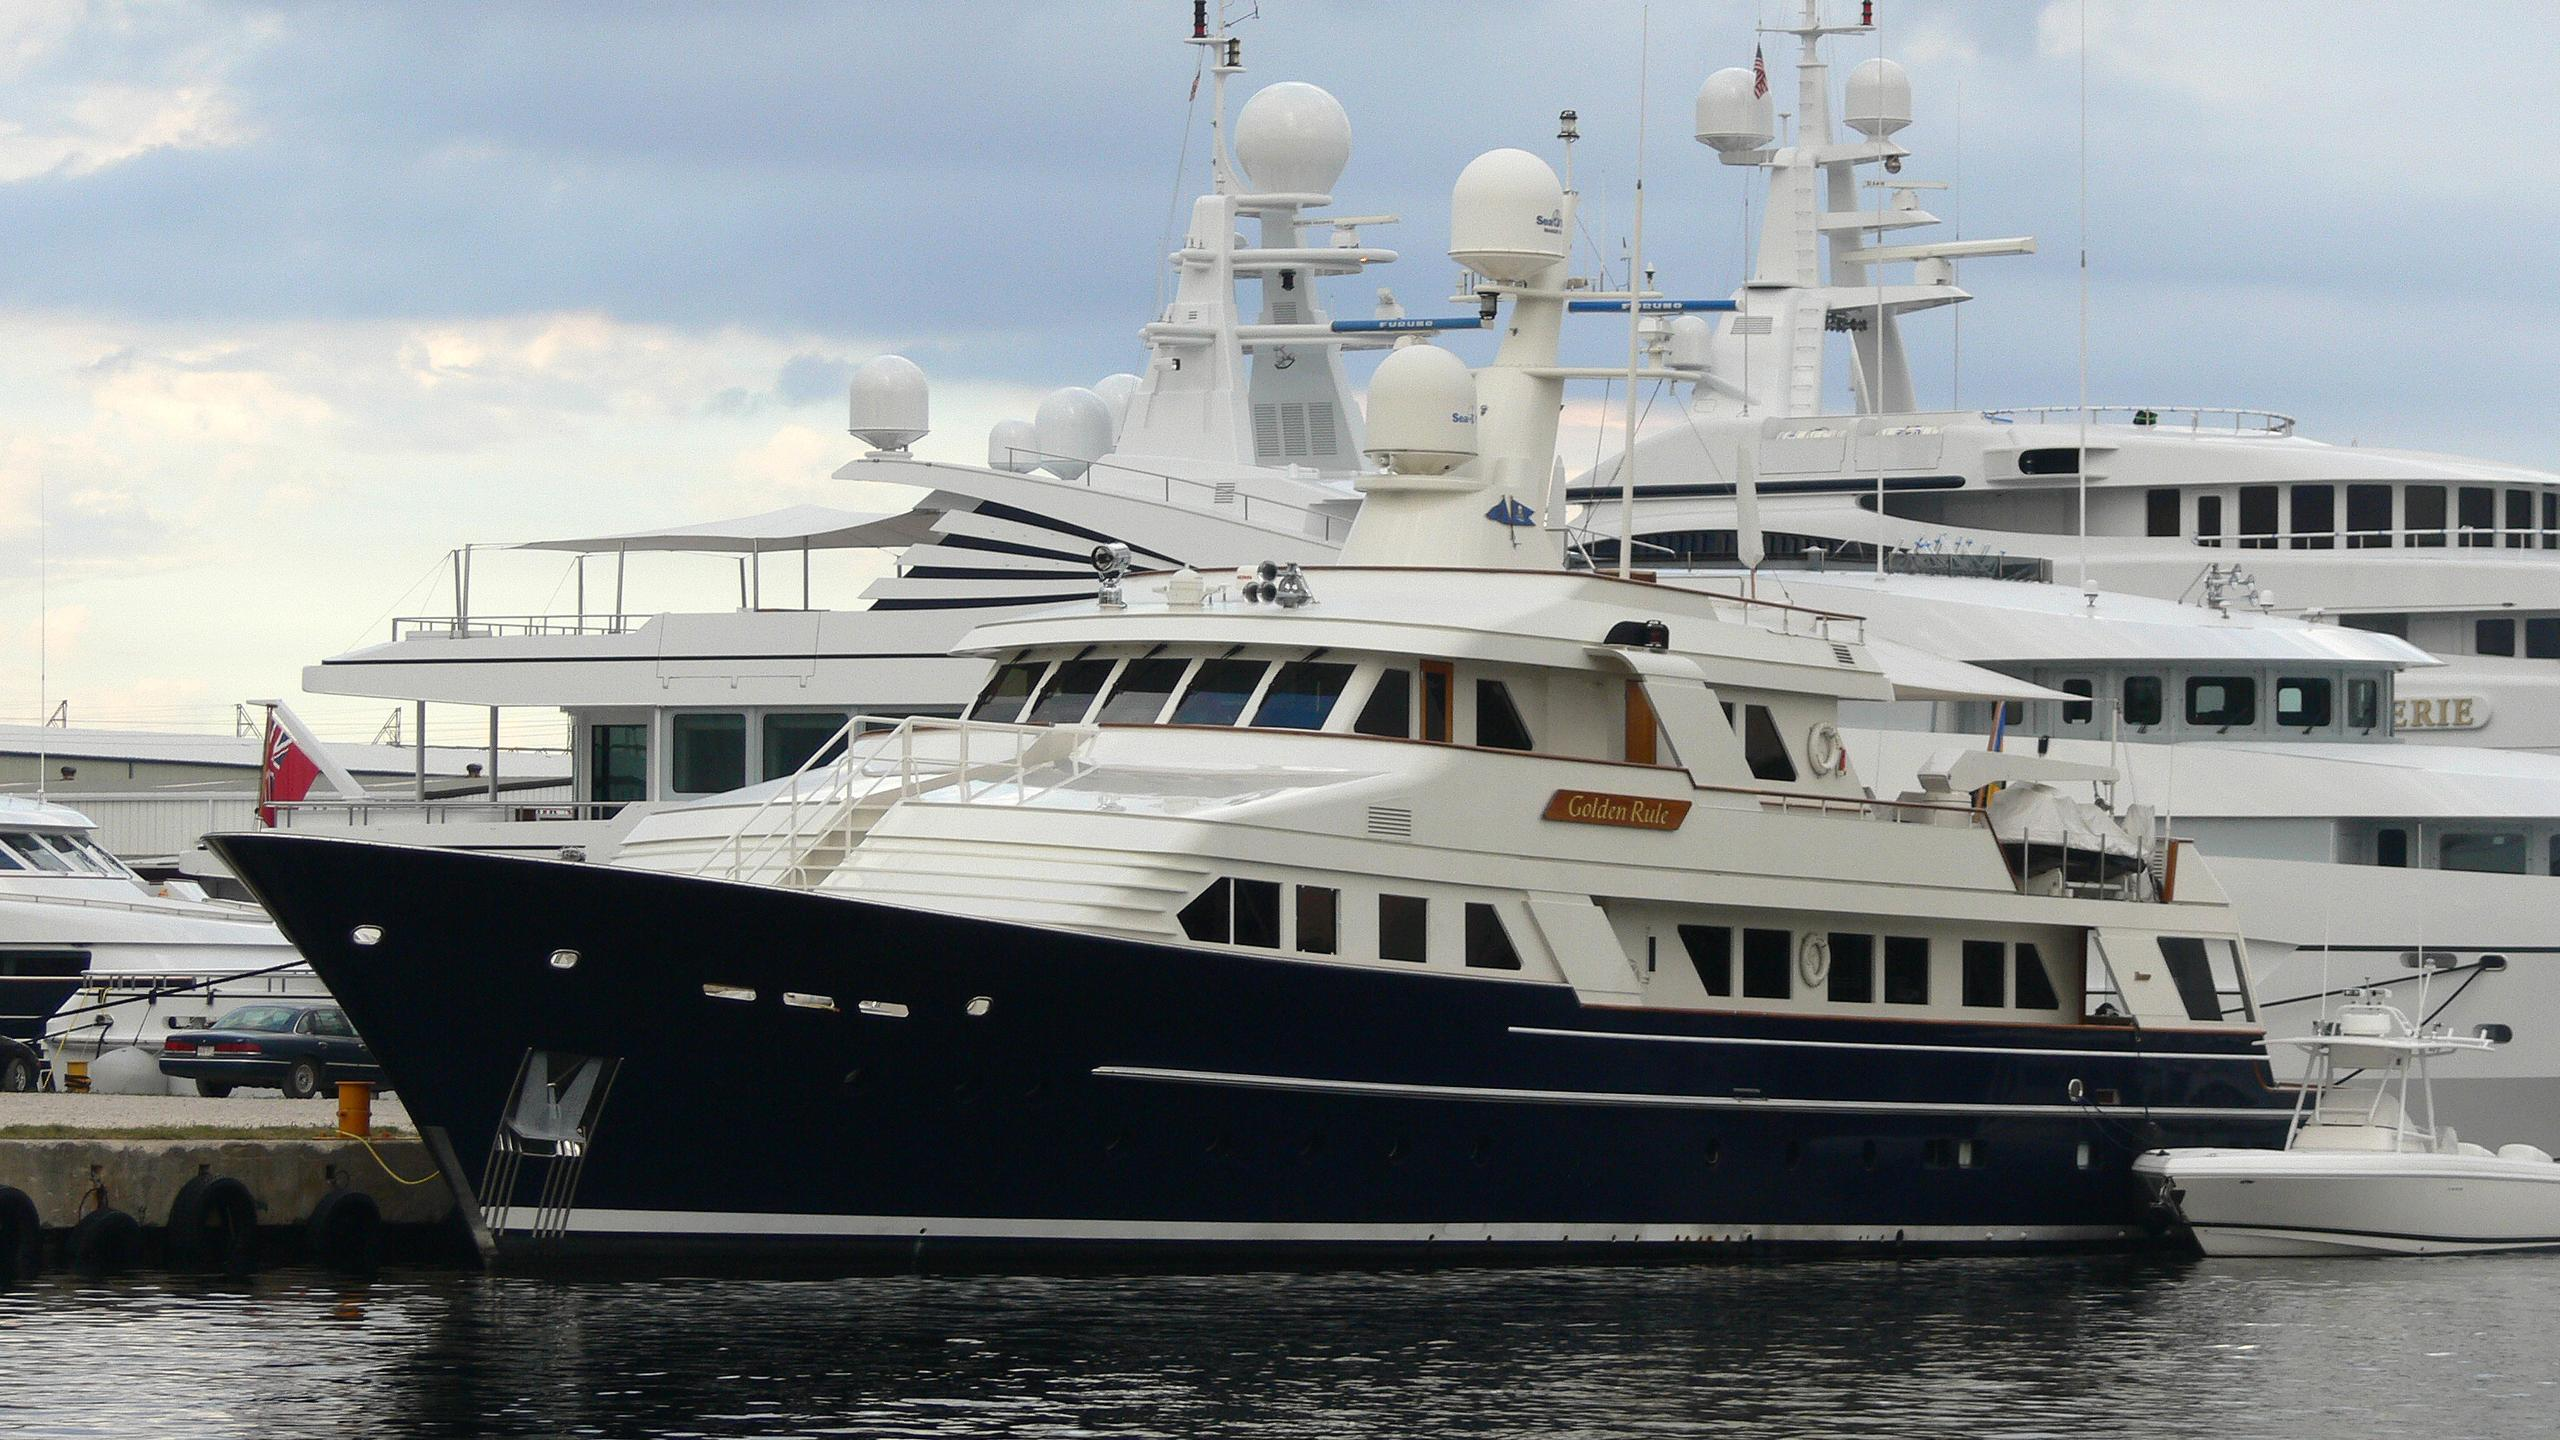 miss-iloilo-motor-yacht-feadship-1986-39m-half-profile-moored